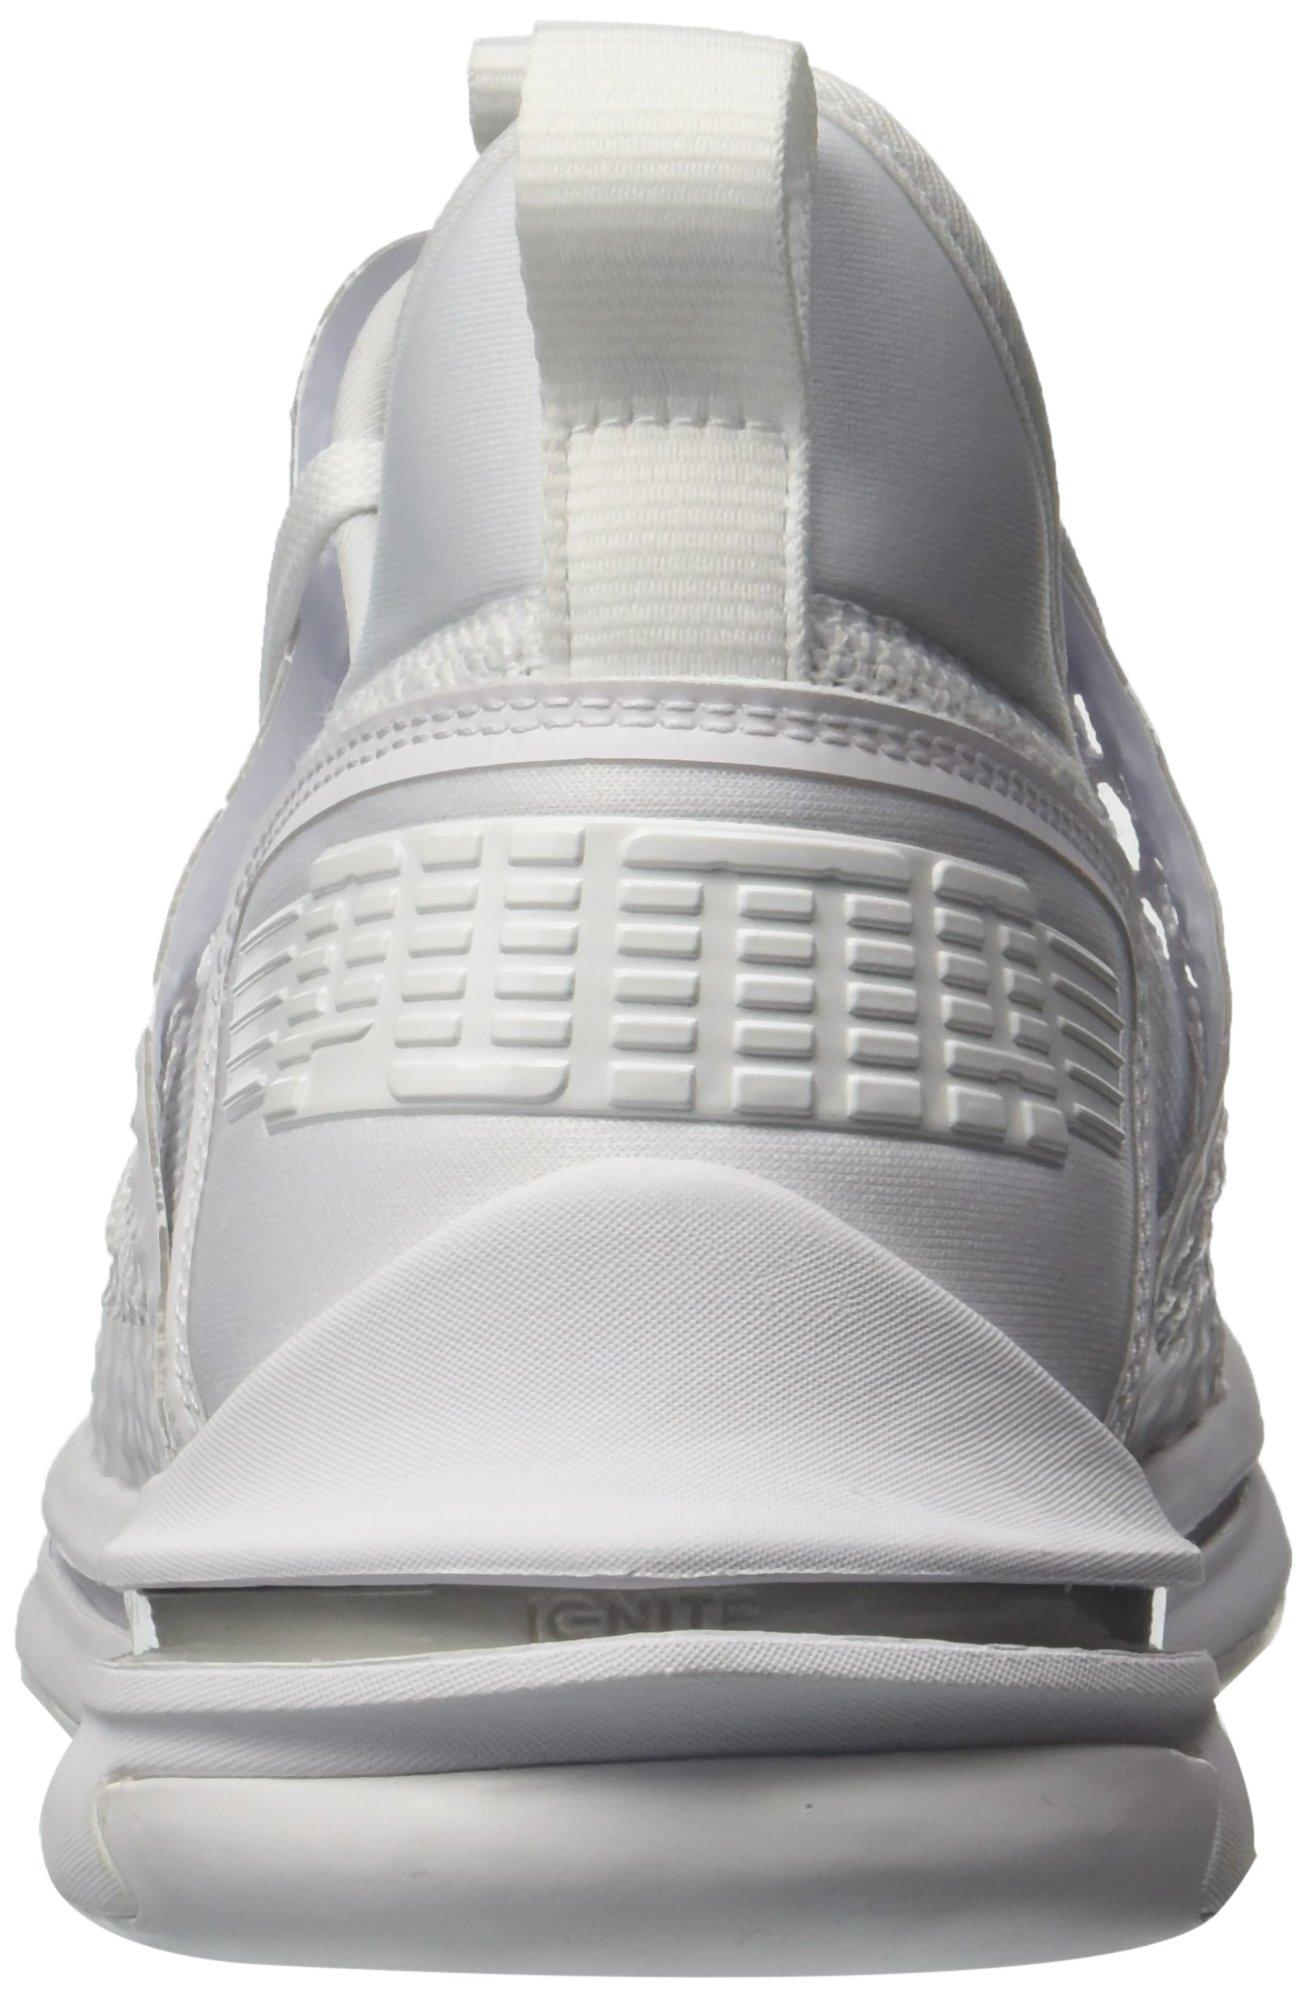 free shipping 2cfe6 5fe34 M US Mens 10 Ignite Sneaker Netfit PUMA SR Limitless White W